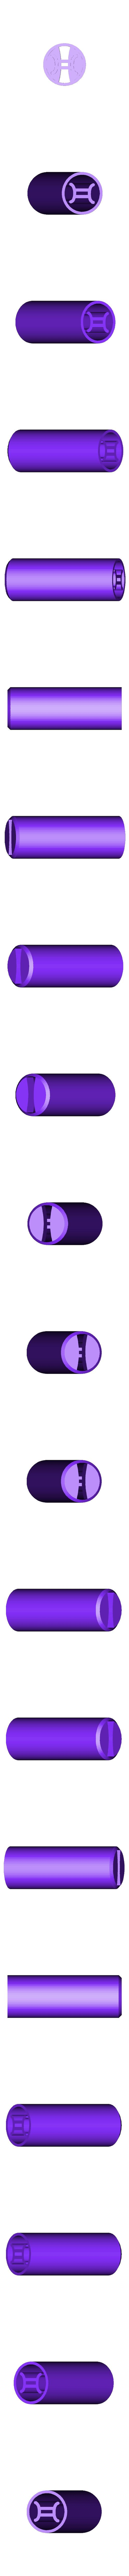 FILTRO 7,5 Geminis (ENTRAENPITI) v1.stl Download STL file FILTER TIPS - 89 FILTERS- ALL PACKS - WEED FILTER • 3D printer model, Weed420House